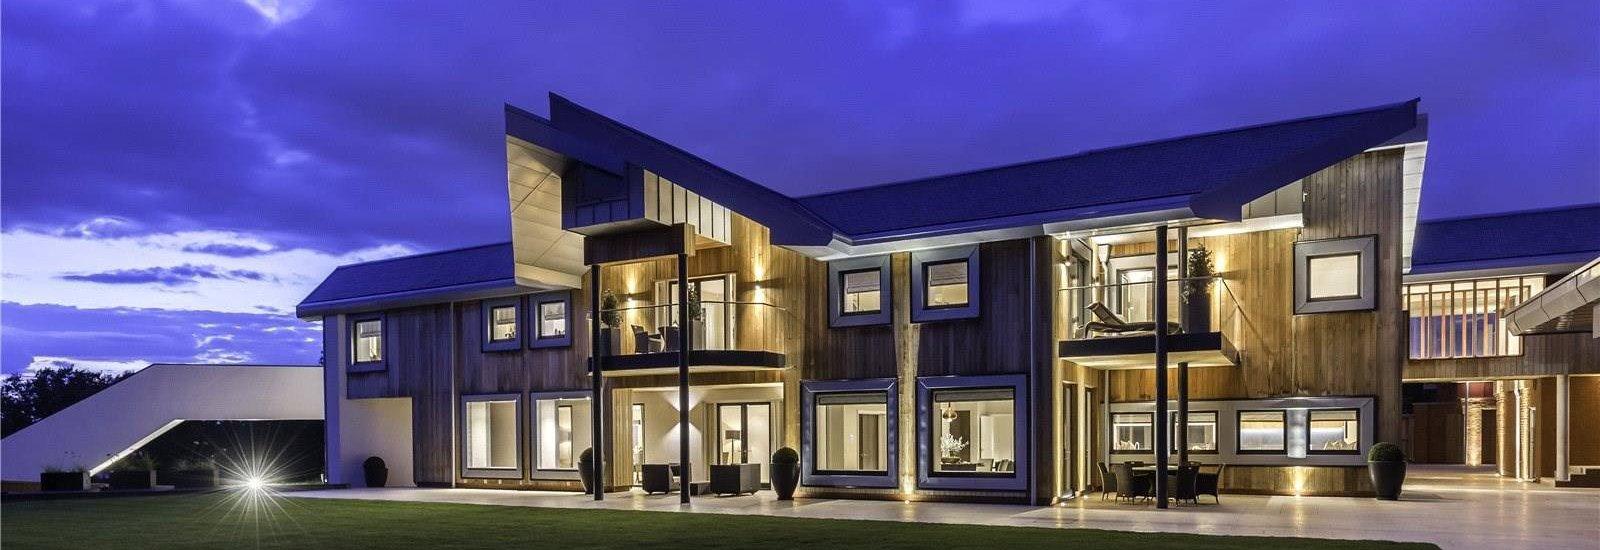 Artistry Innovation 6 Contemporary Homes